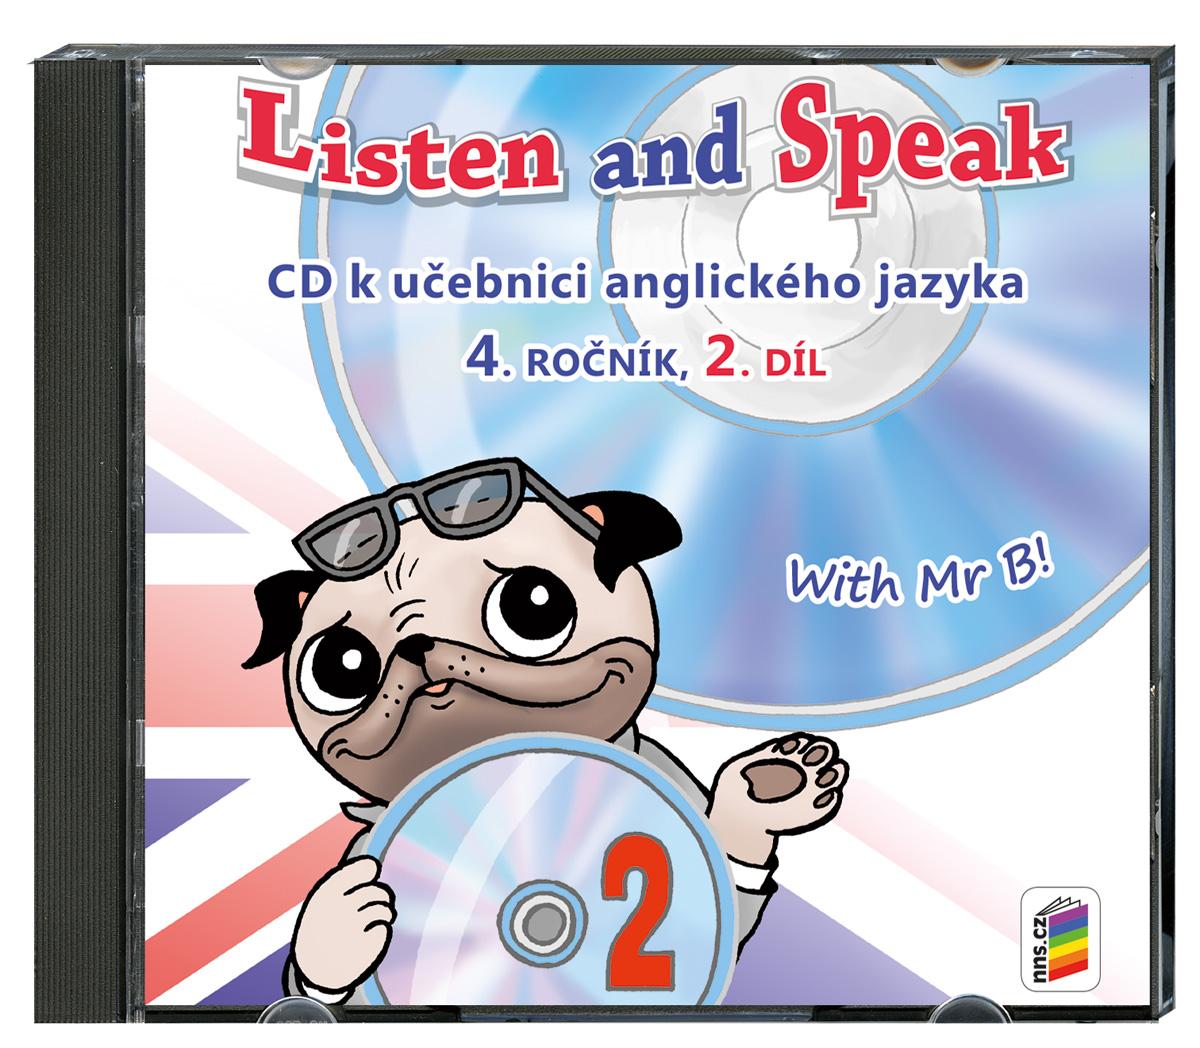 CD Listen and Speak, 2. díl